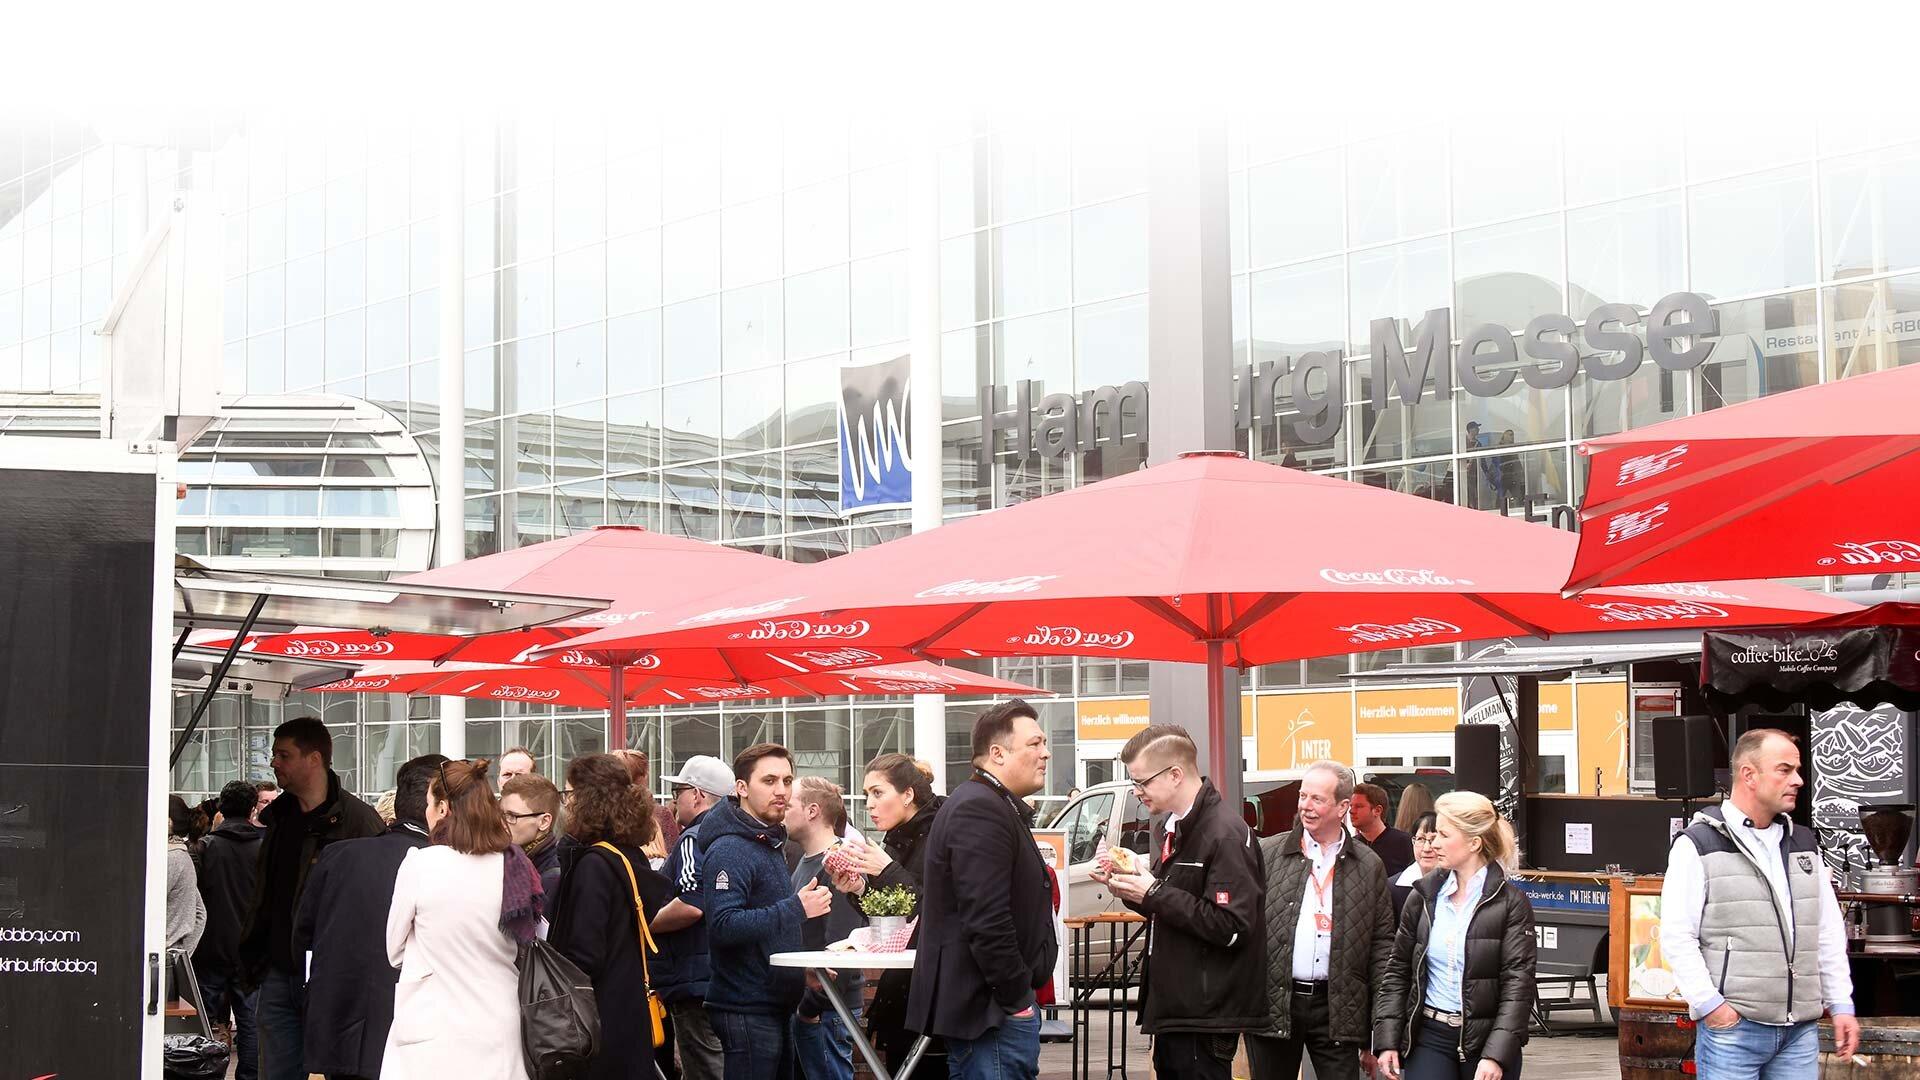 Messe Hamburg - Internorga